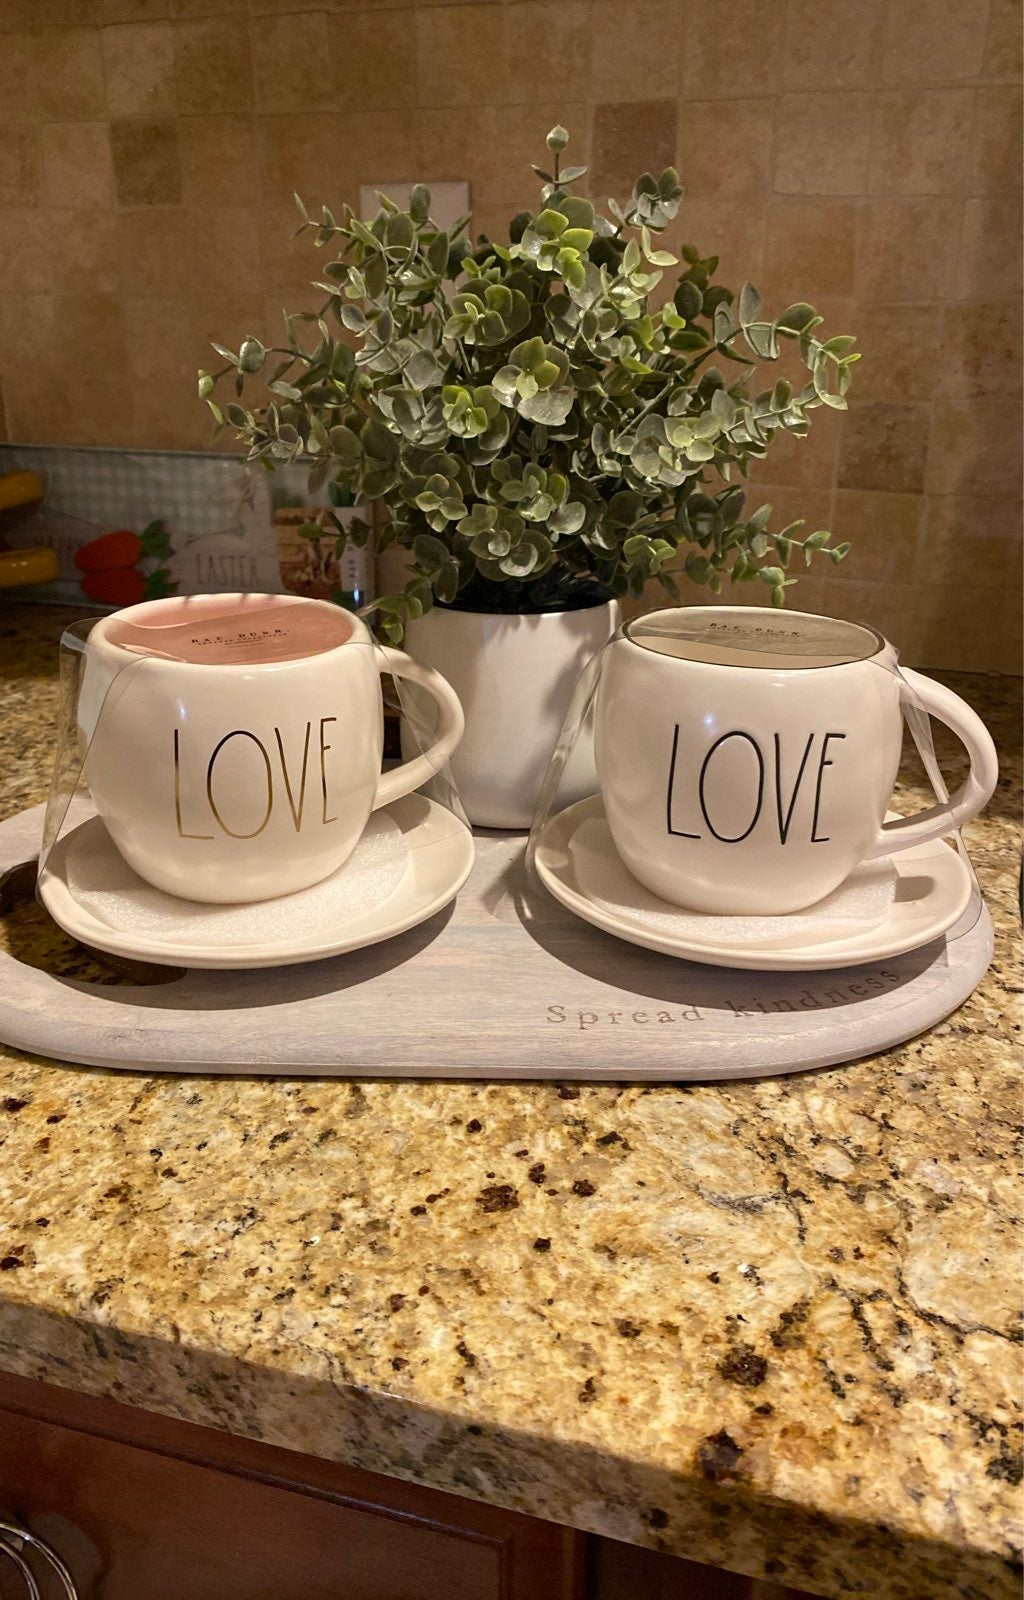 Rae Dunn New Tea Cup and Saucer LOVE Set